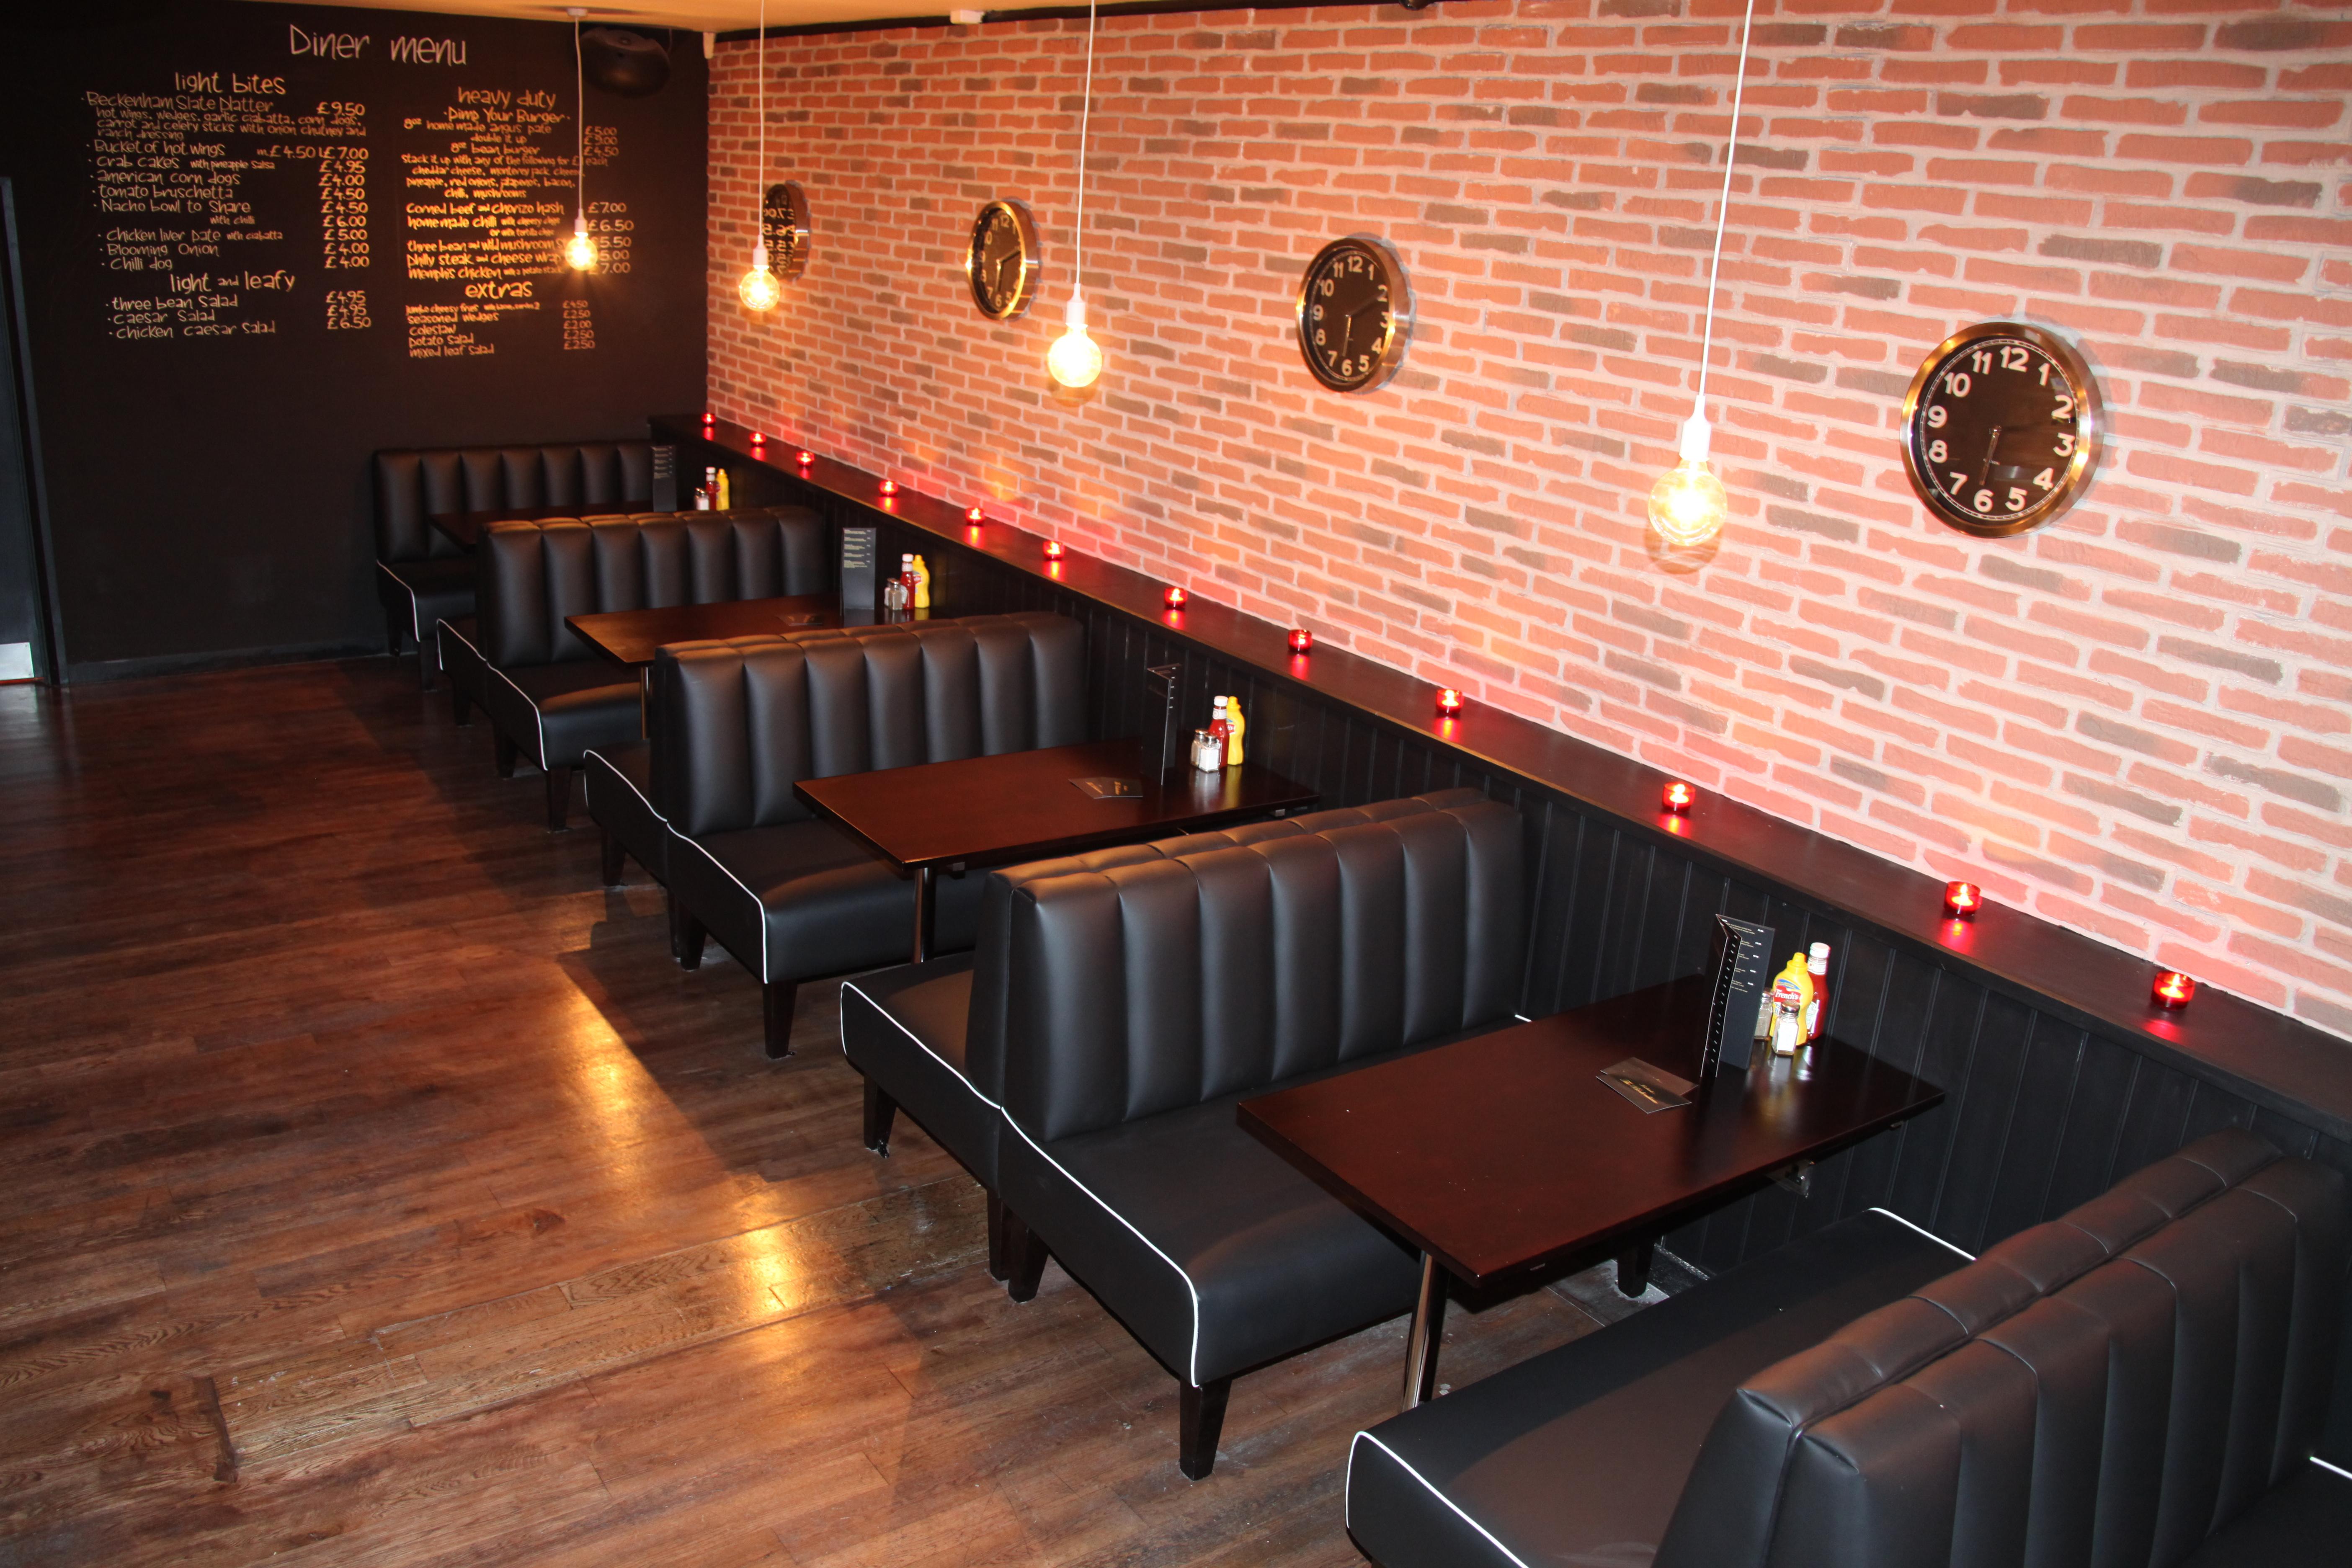 The beckenham cocktail bar cocktail lounge south london yoo design yoo yoo brand - Brick bar design ...